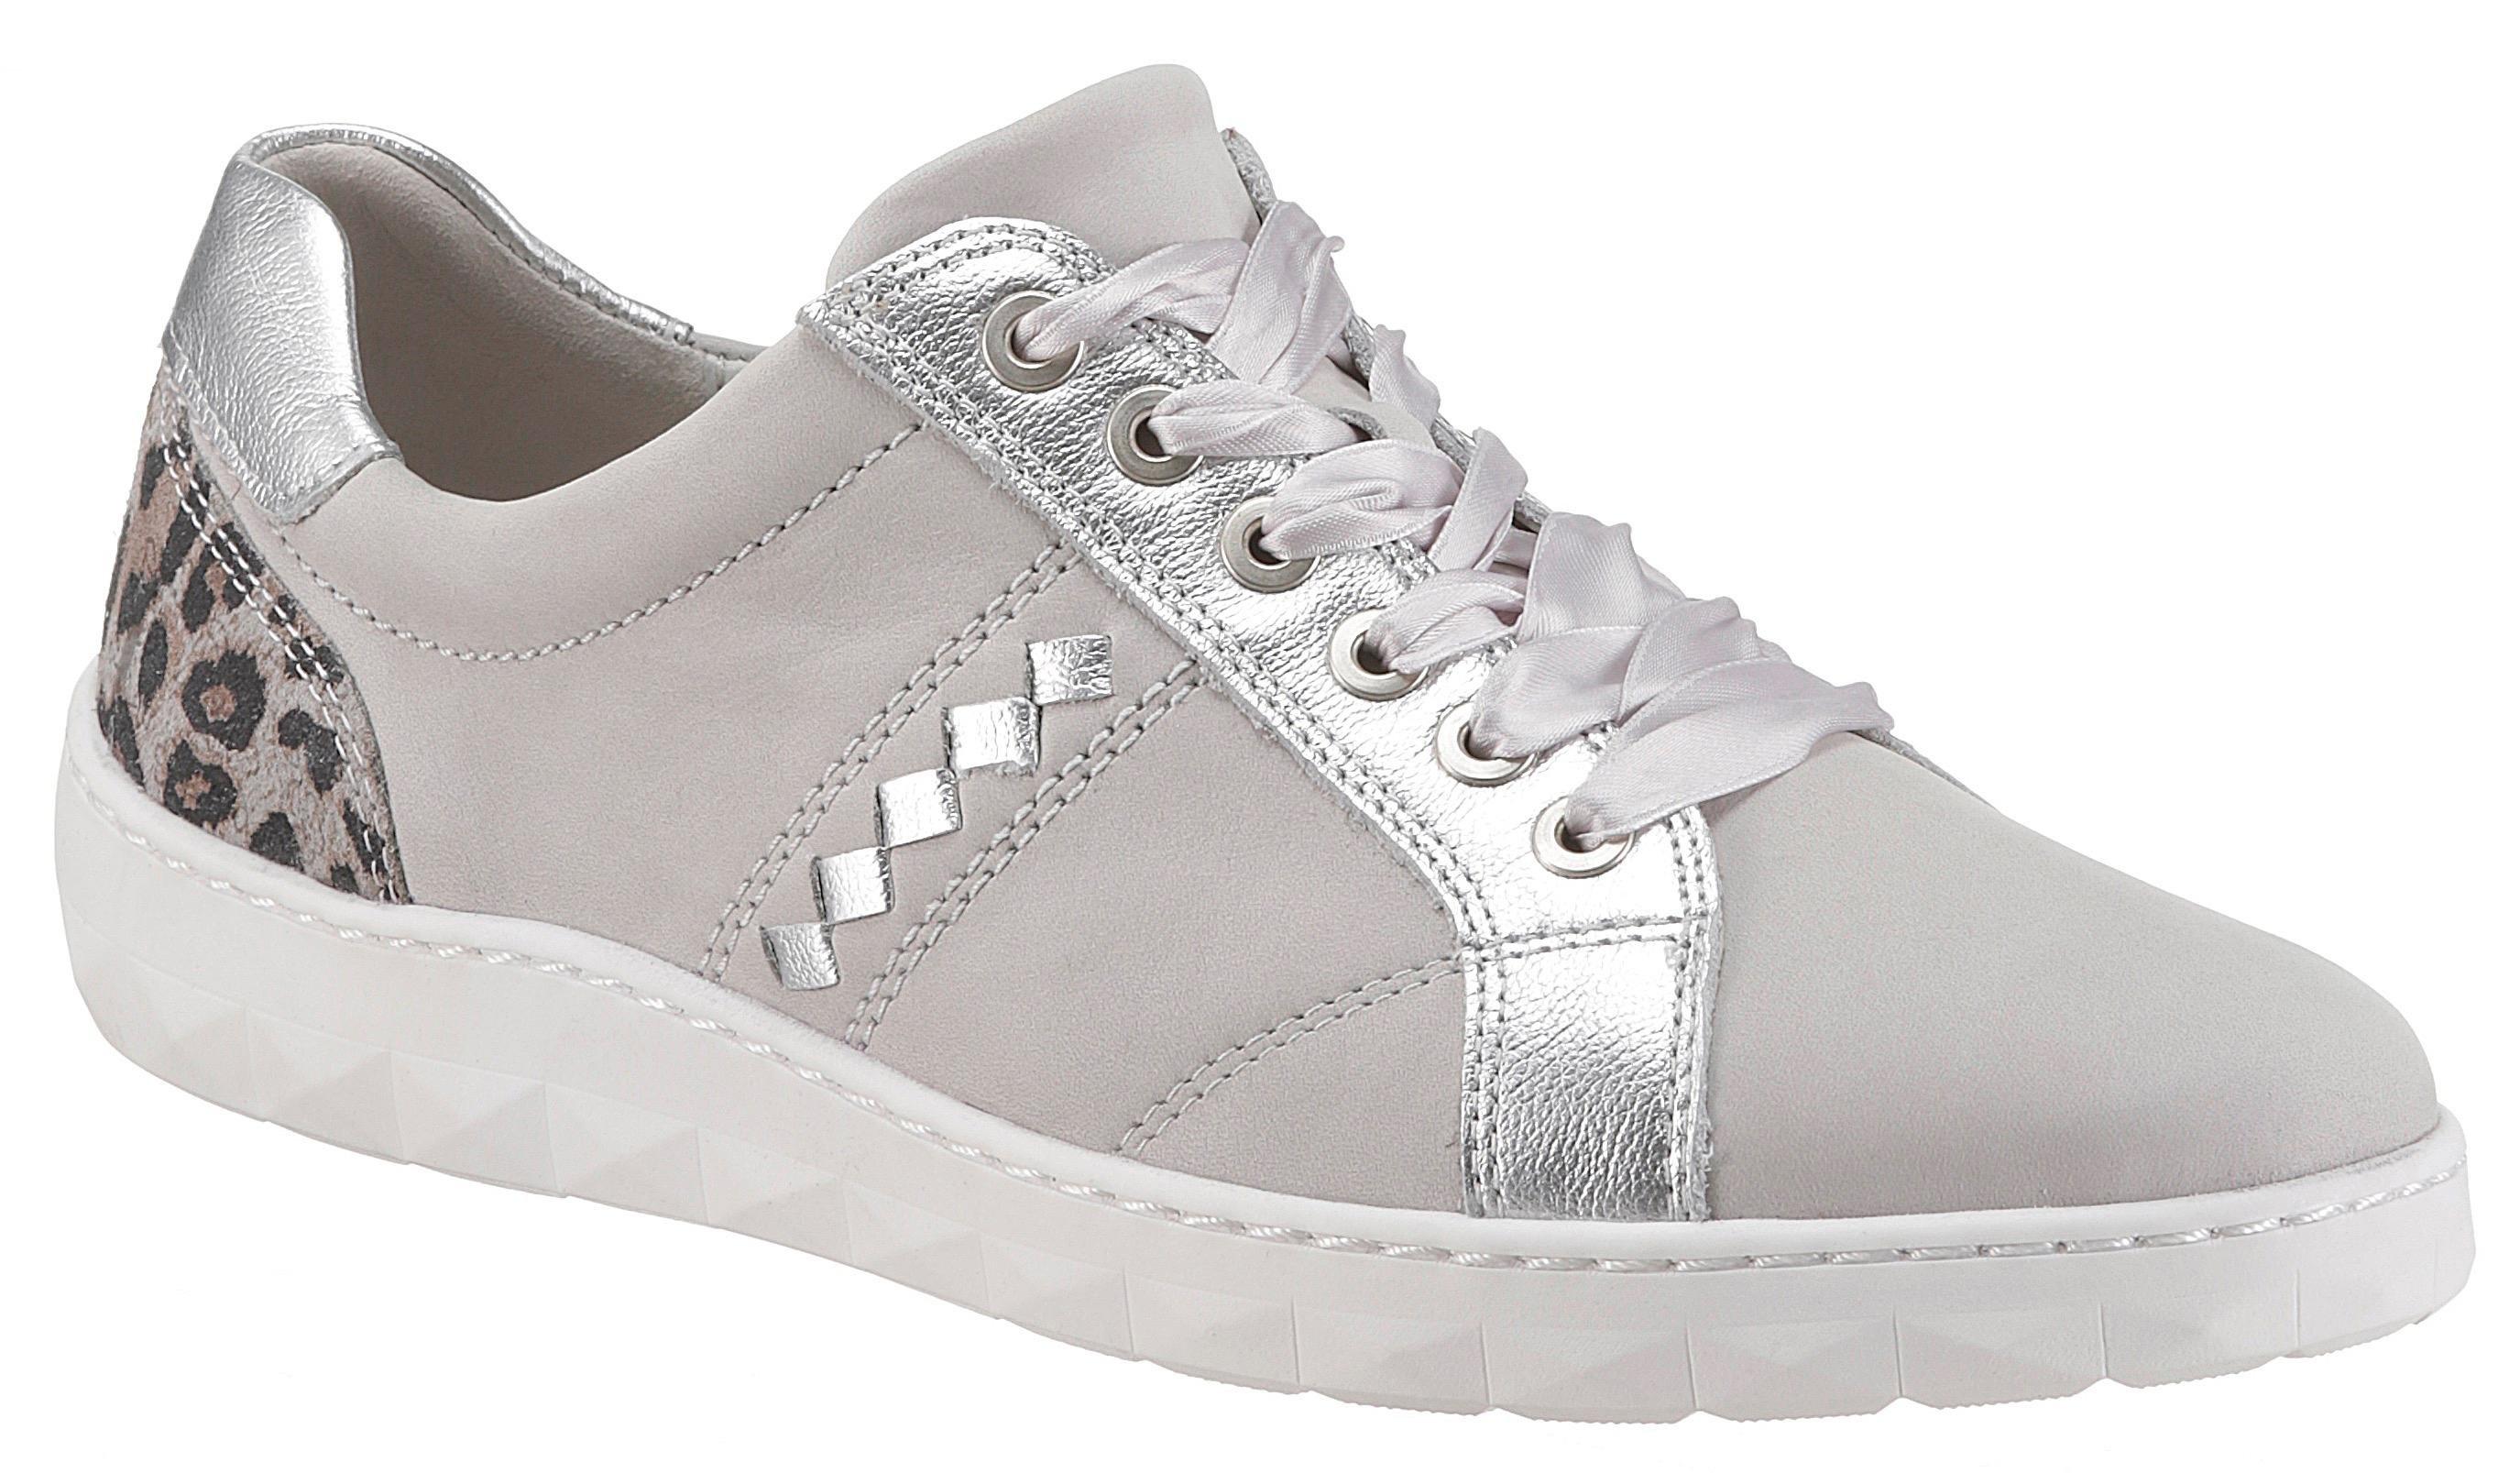 Online Shop Waldläufer Waldläufer Sneakersherne Online Sneakersherne 8X0wPknO